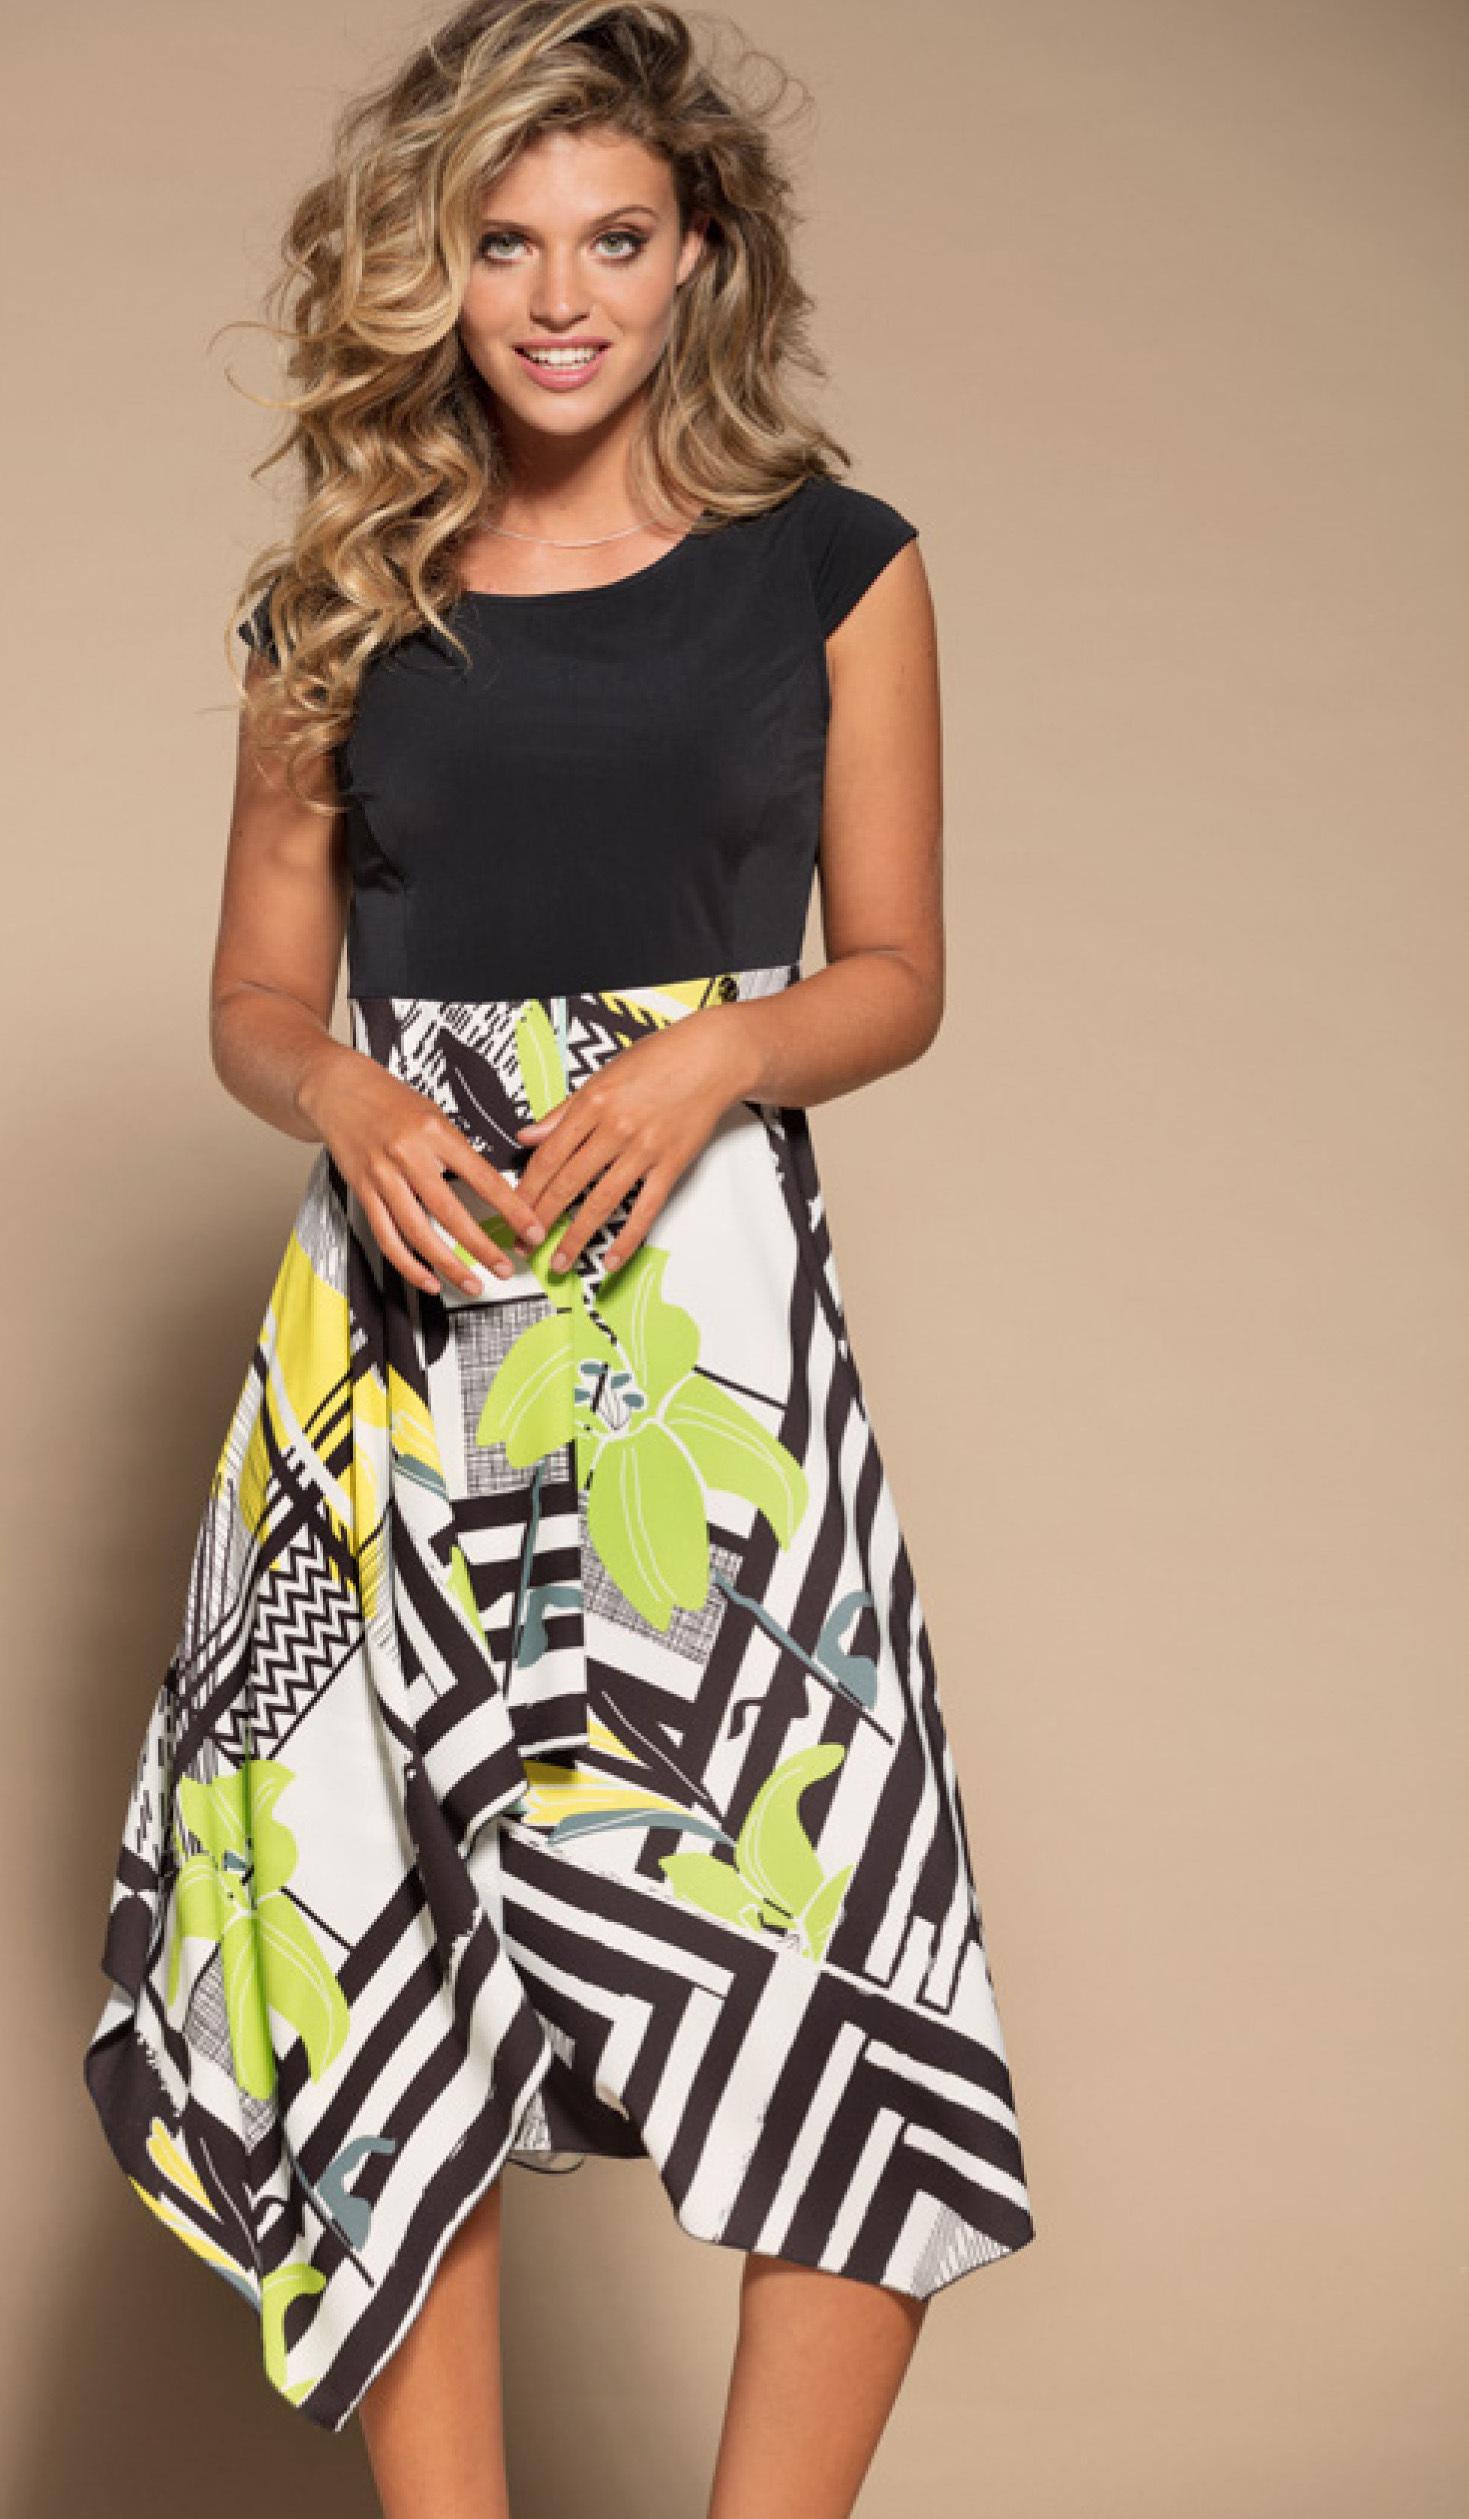 Maloka: Lemon Lime Marble High Waisted Asymmetrical Midi dress MK_NELY